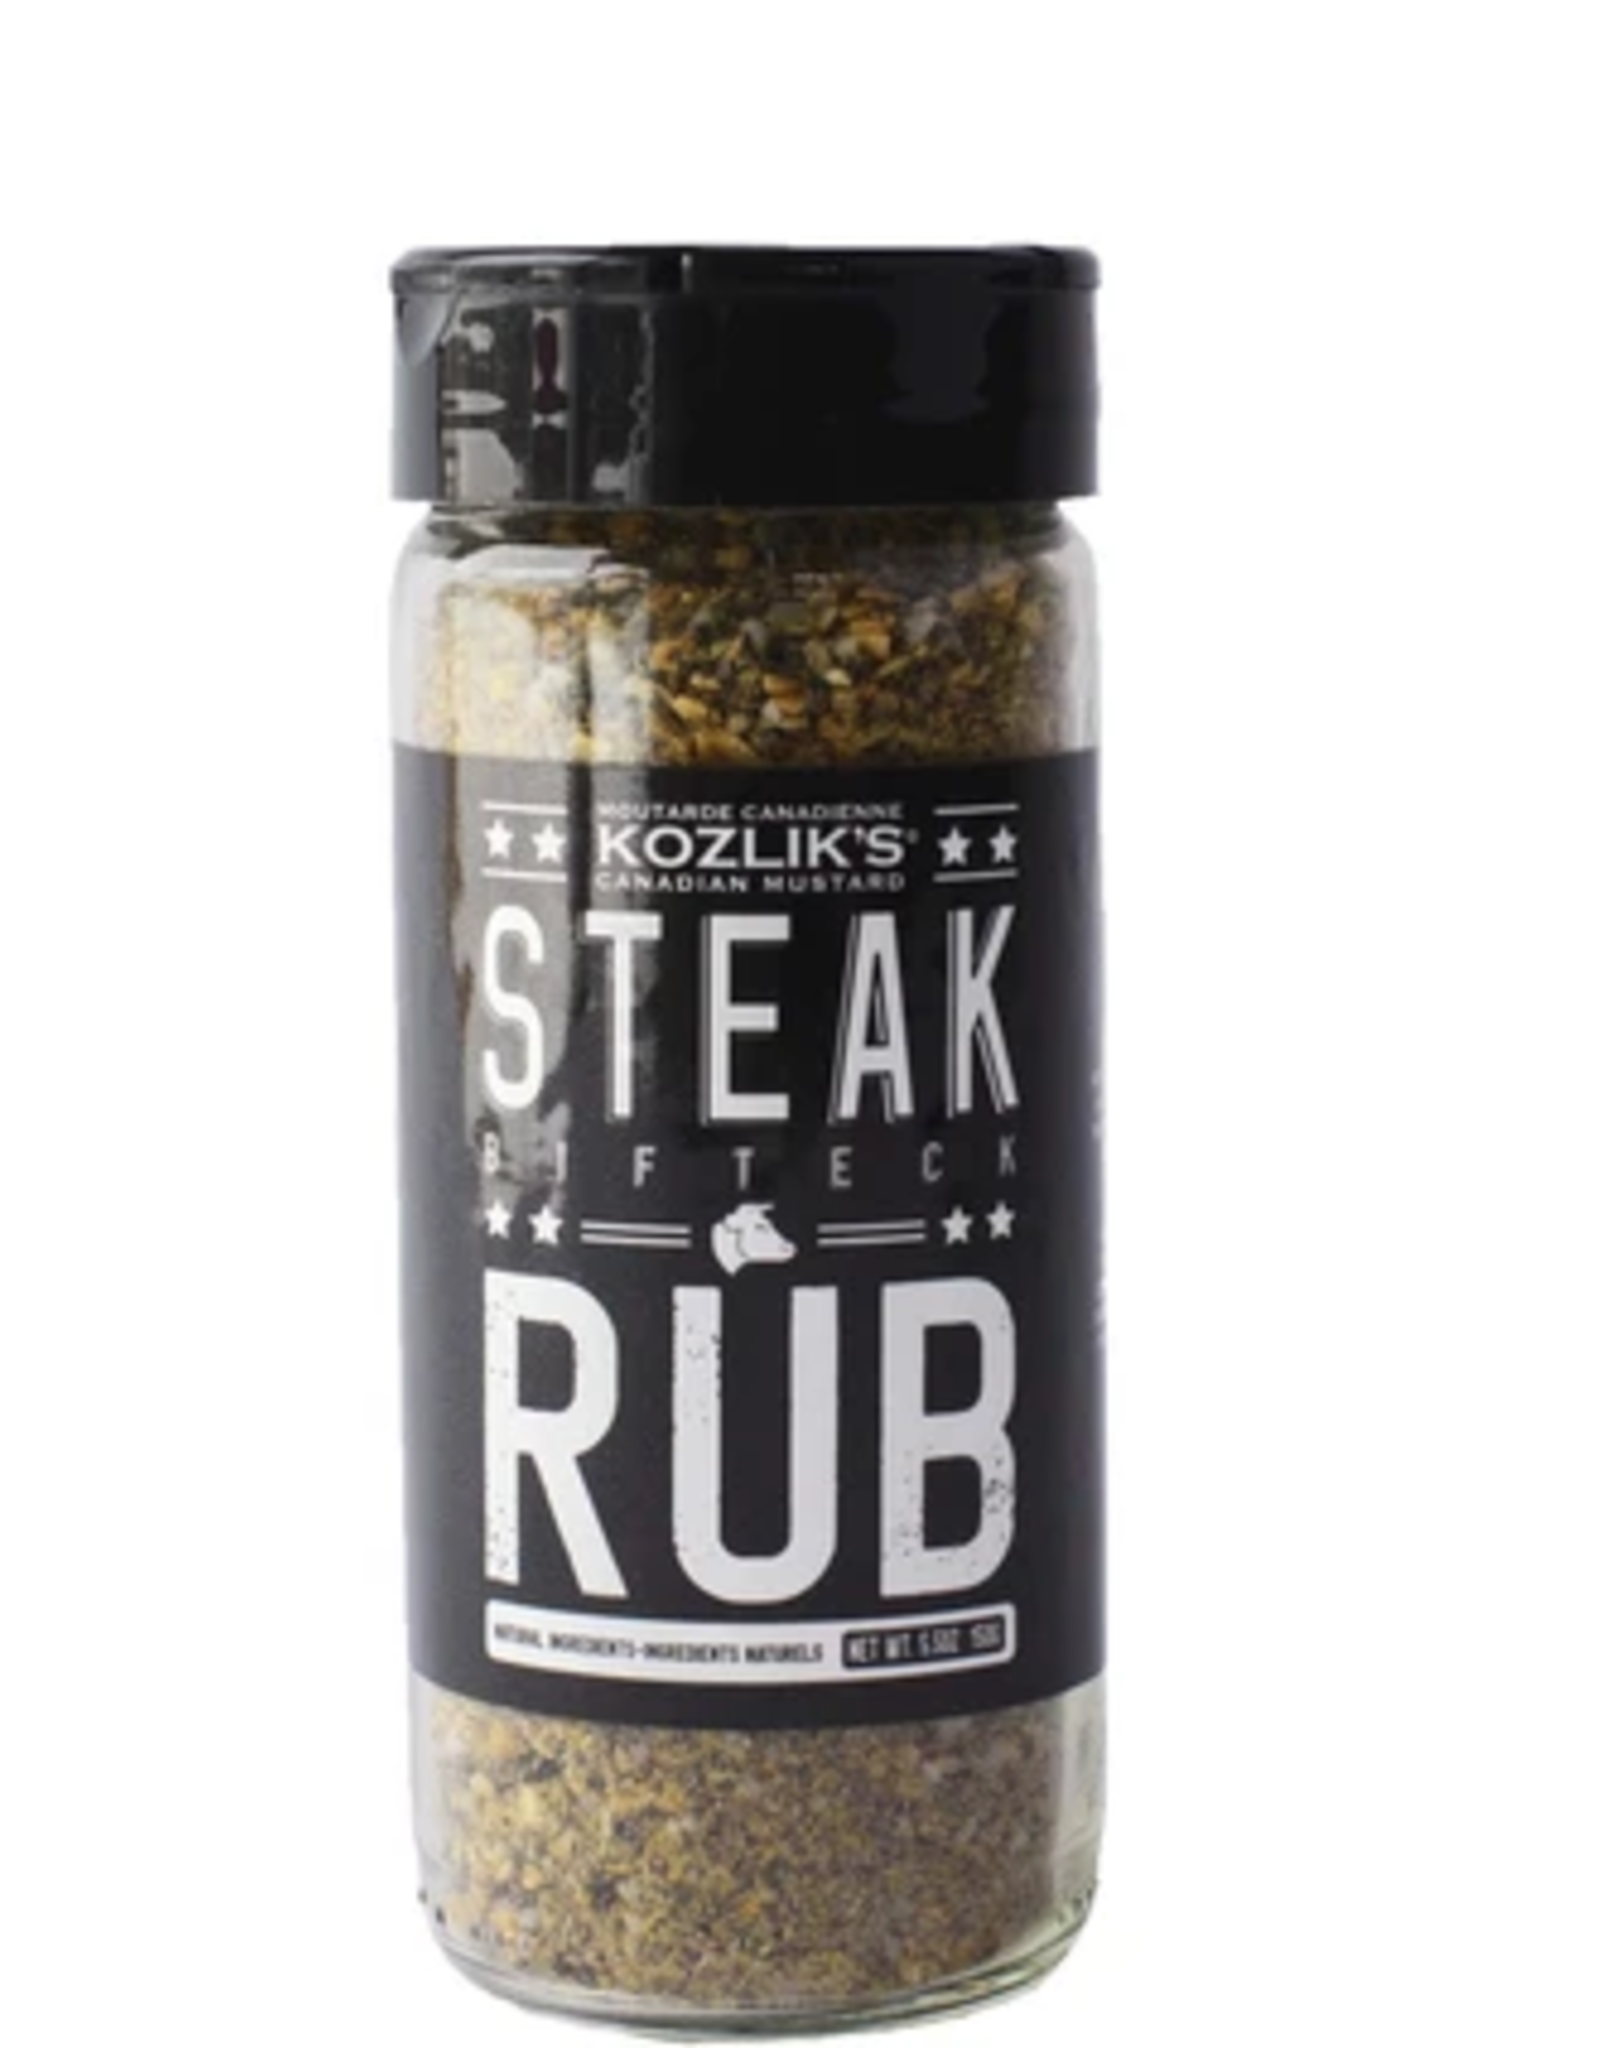 Kozlik's Steak Rub